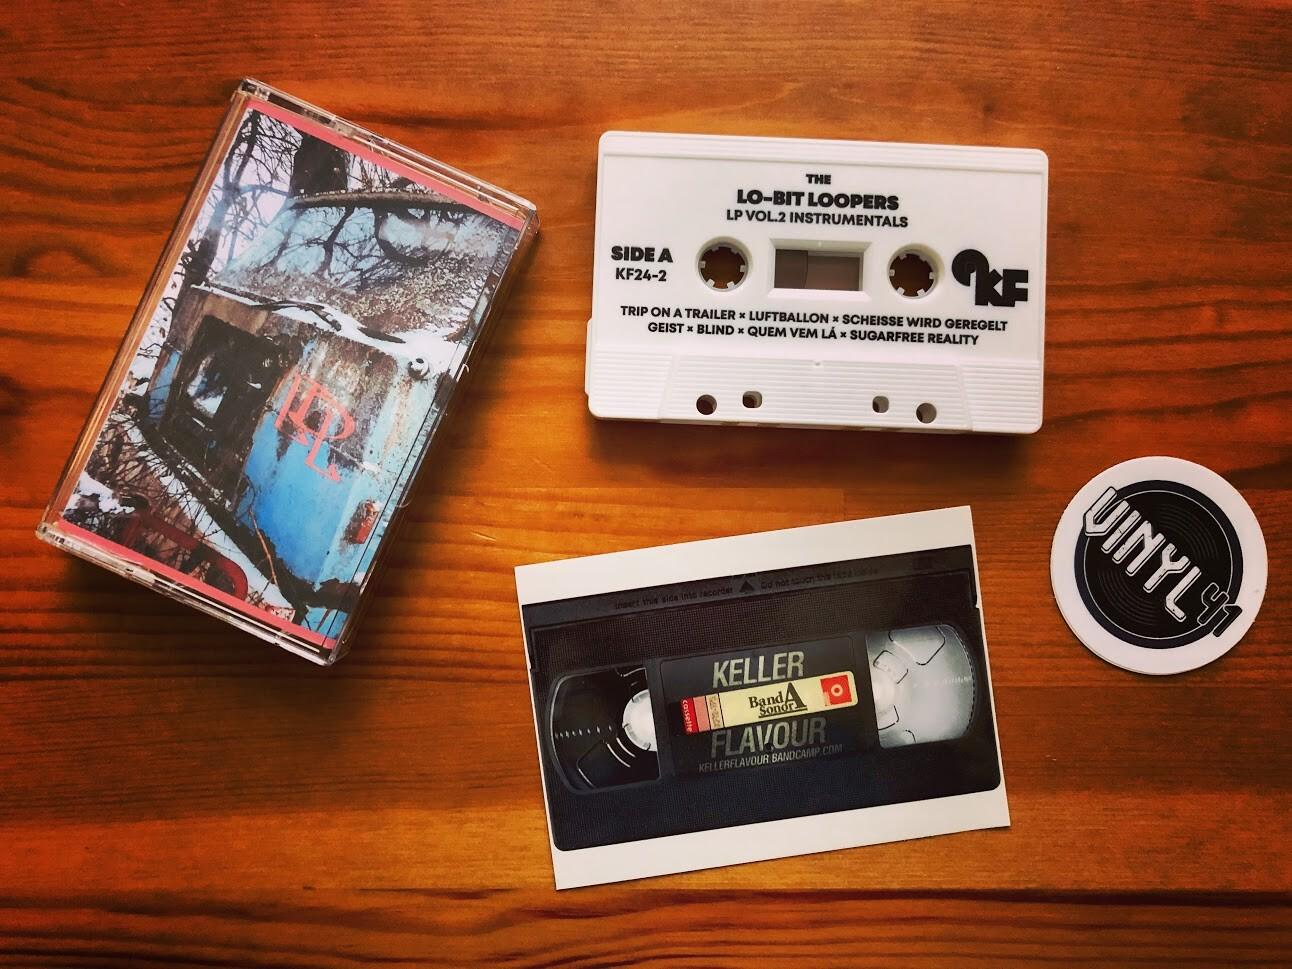 Lo-Bit Loopers Vol. 2 Instrumental Tape